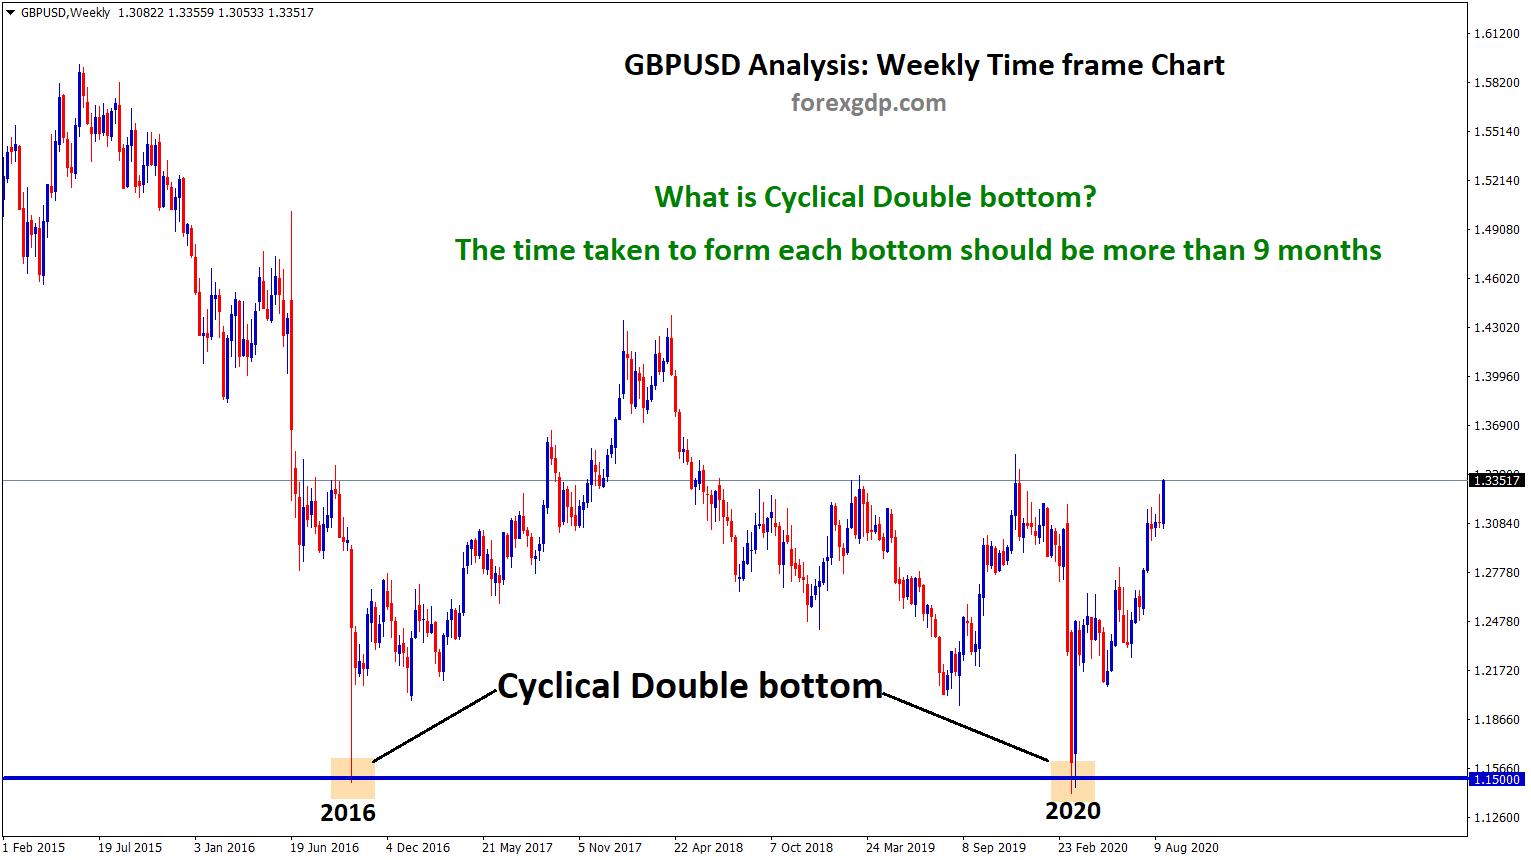 gbpusd cyclical Double bottom